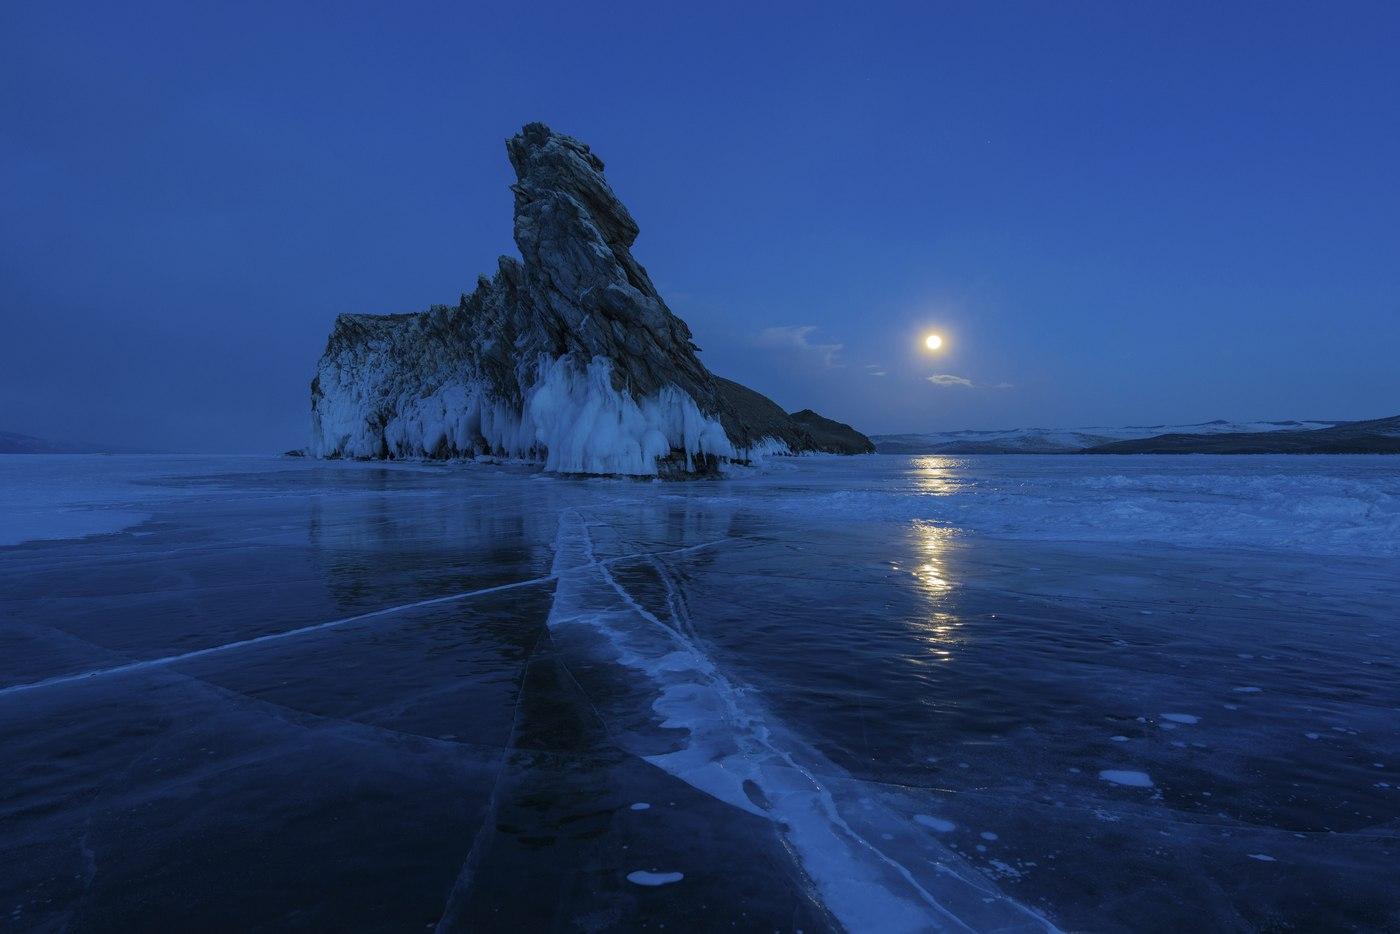 Теплый вечер на берегу озеро Байкал. Октябрь 2015 года.